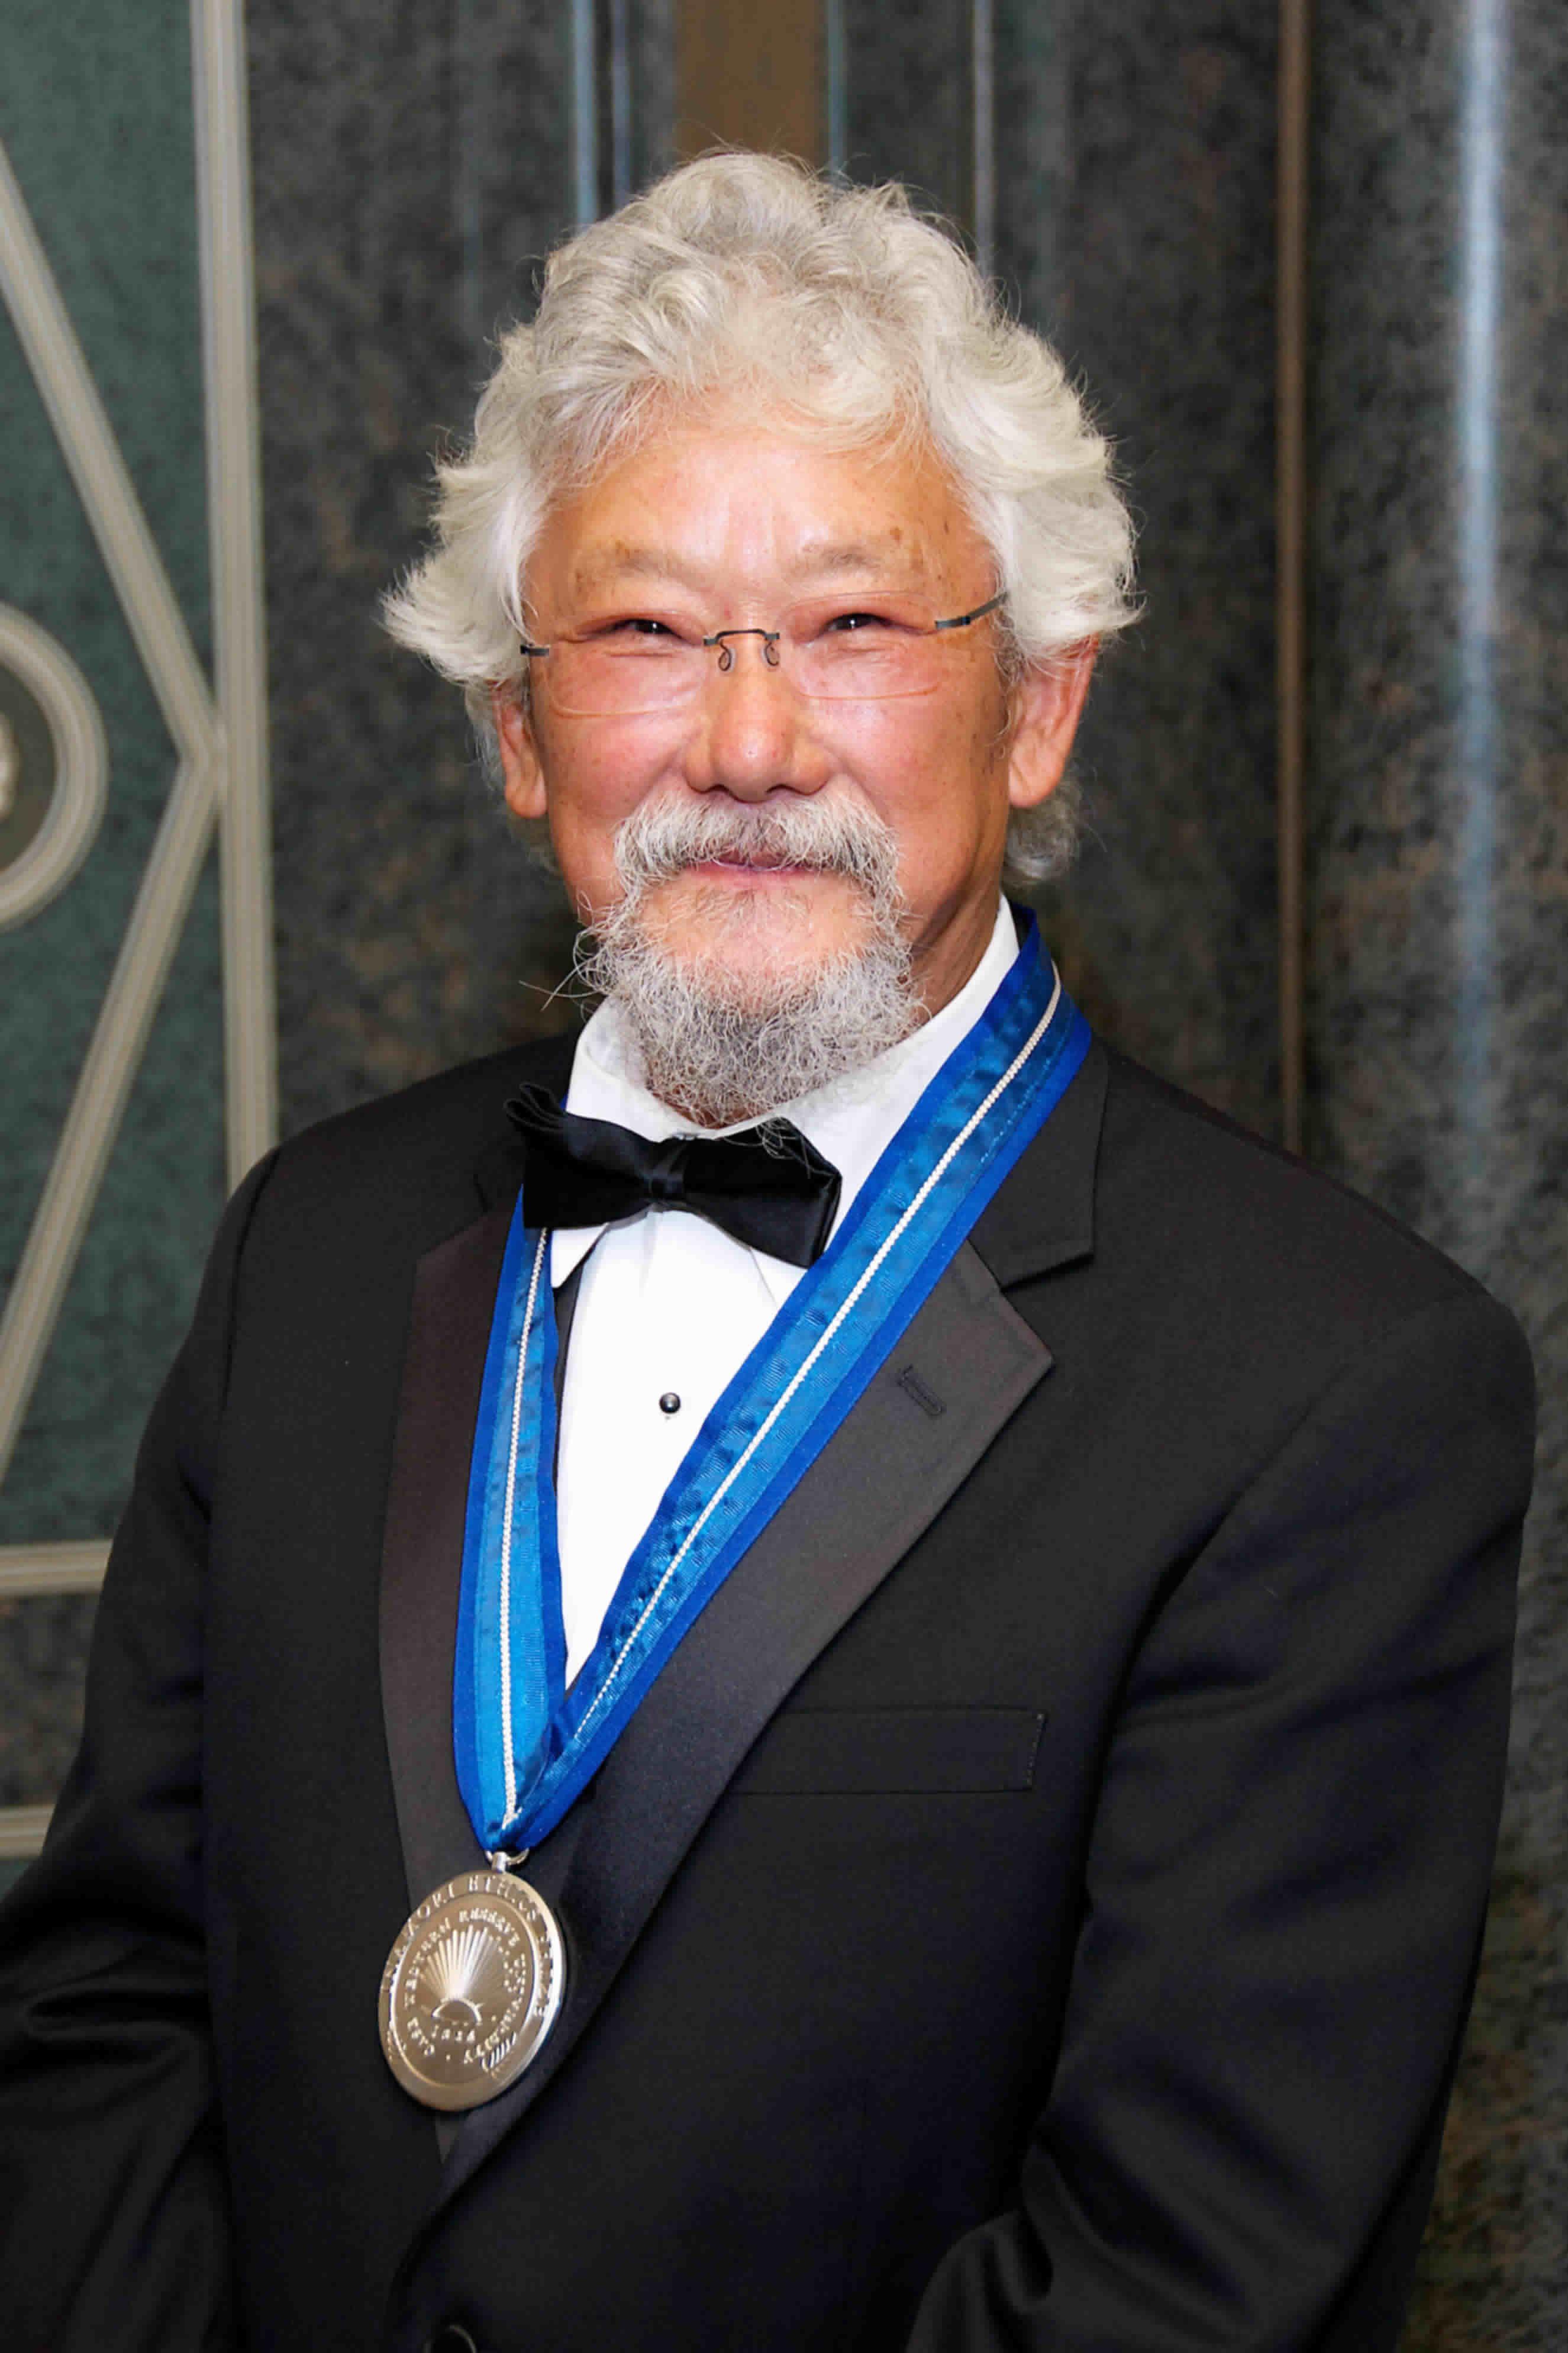 Case Western Reserve University Inamori Ethics Prize